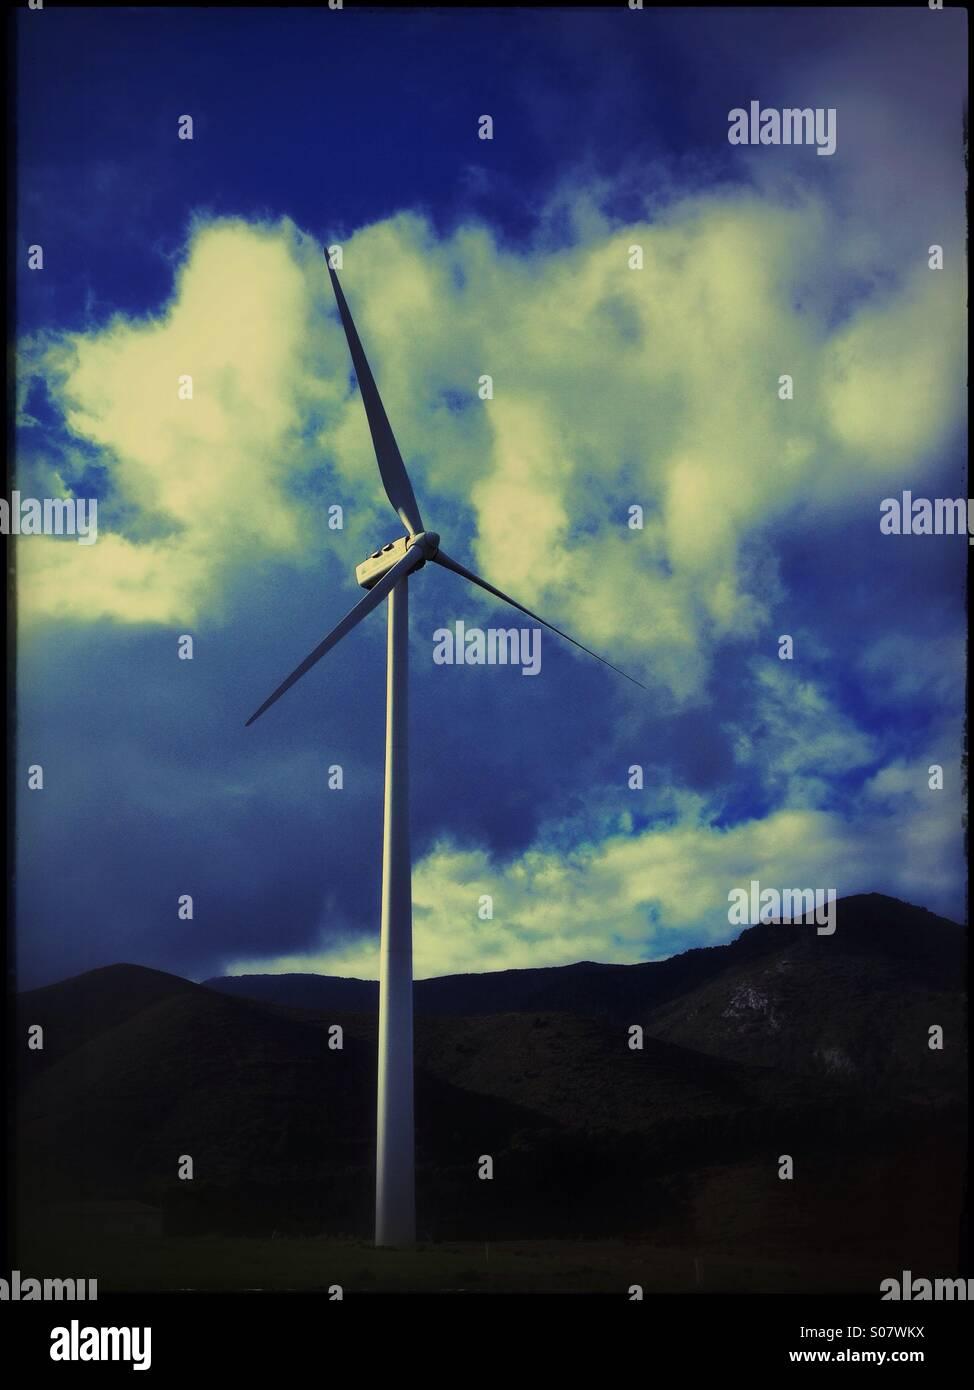 Windmühle, Spanien. Stockbild